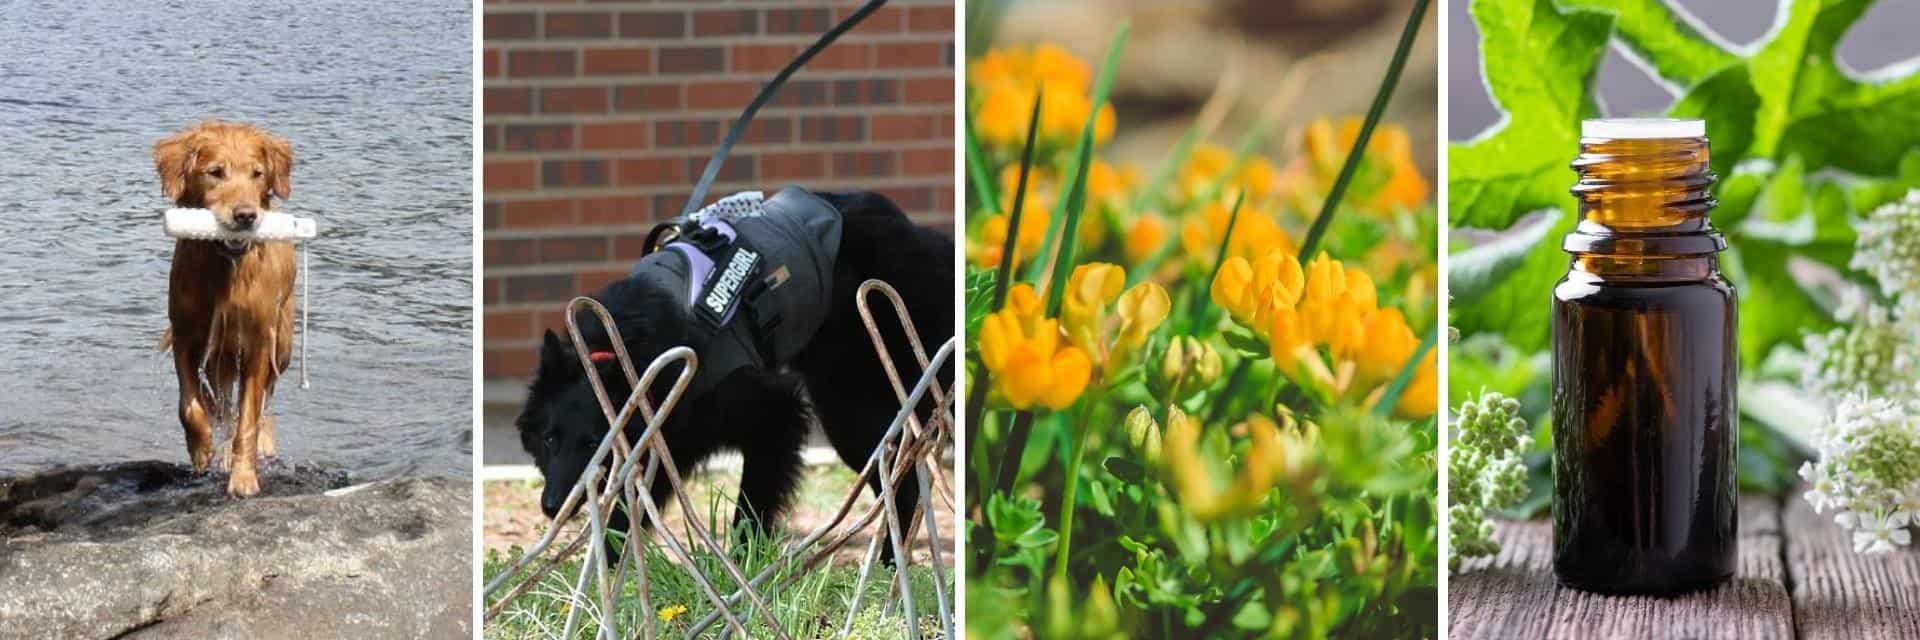 Aldaron flower essence blends for dogs - success stories